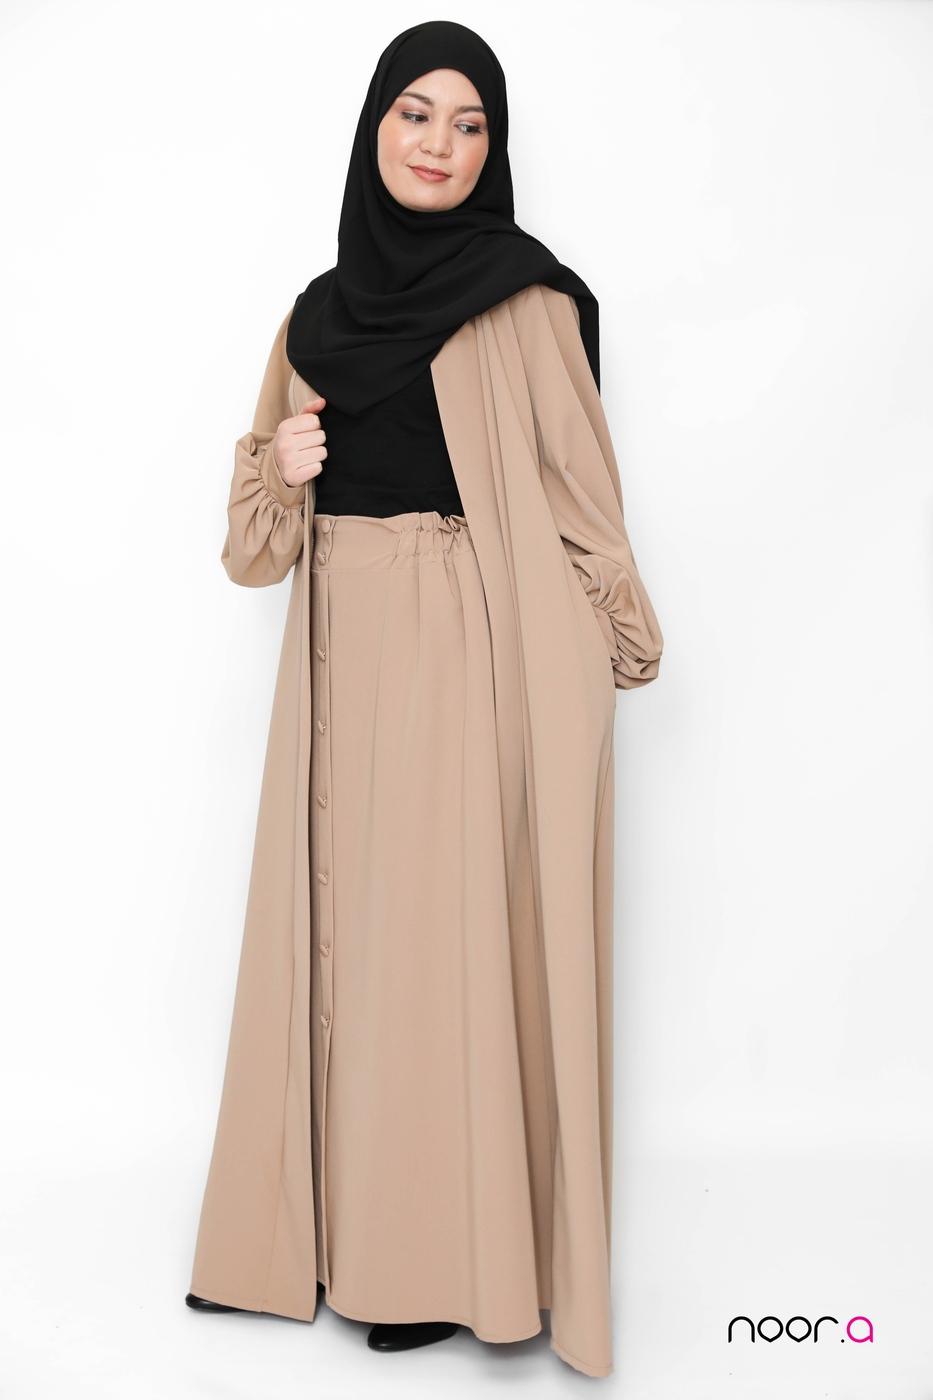 kimono-manches-ballon-camel-jupe-longue-évasée-camel-hijab-jazz-noir (5)